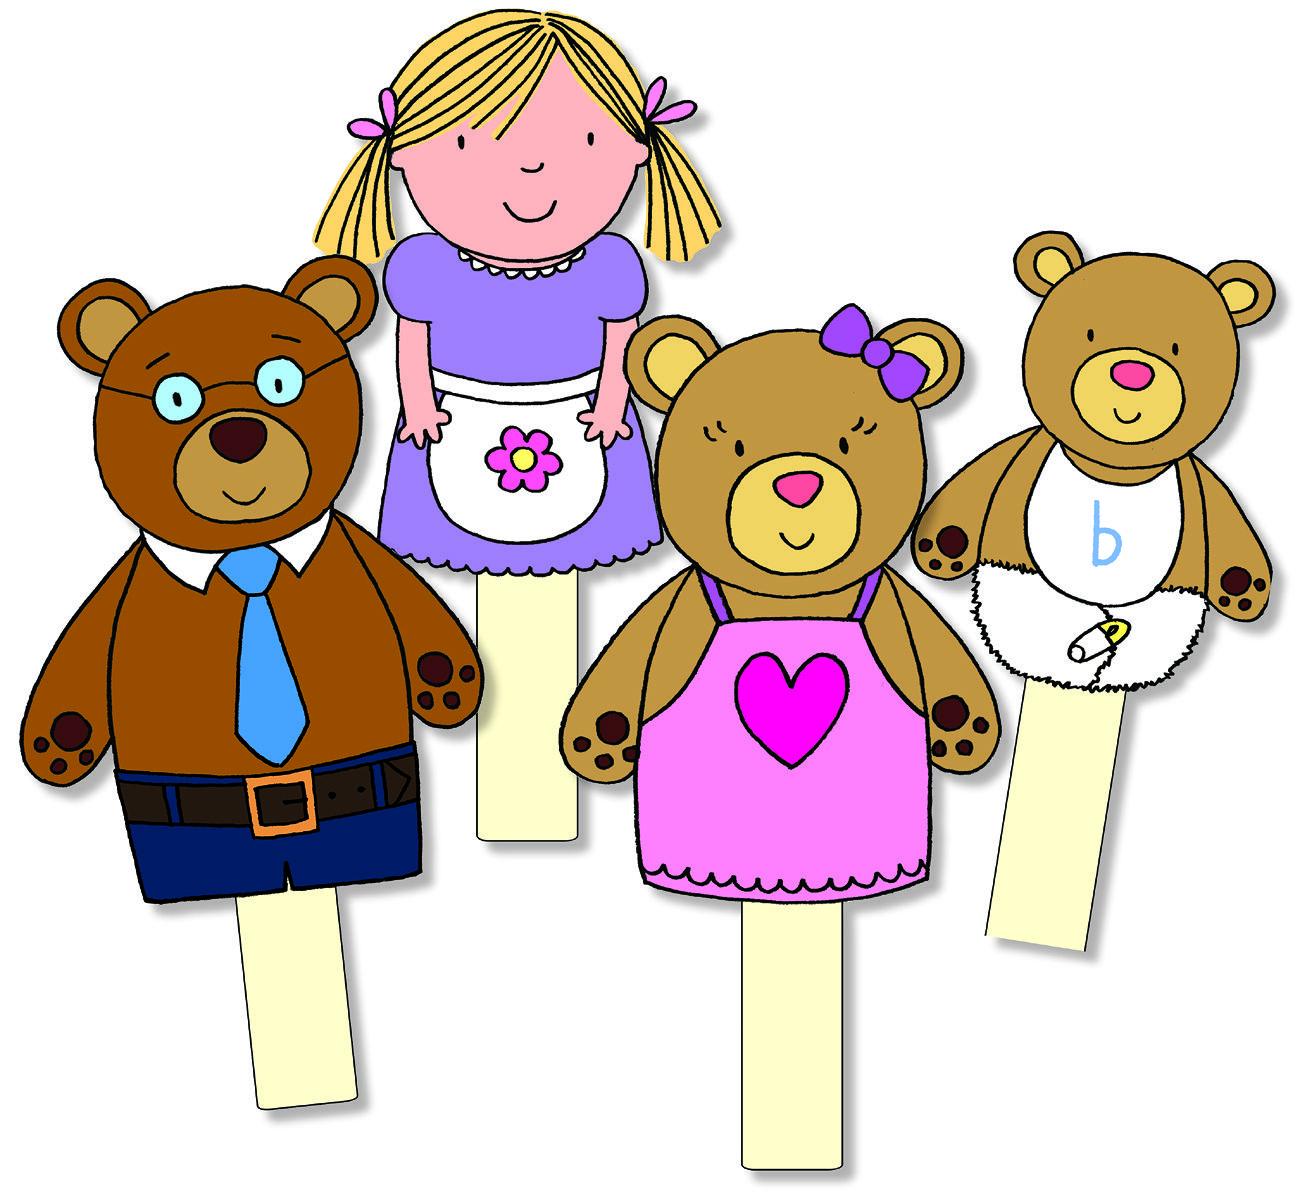 goldilocks the three bears storysticks rh eqd co uk goldilocks and the 3 bears clipart goldilocks and the 3 bears clipart